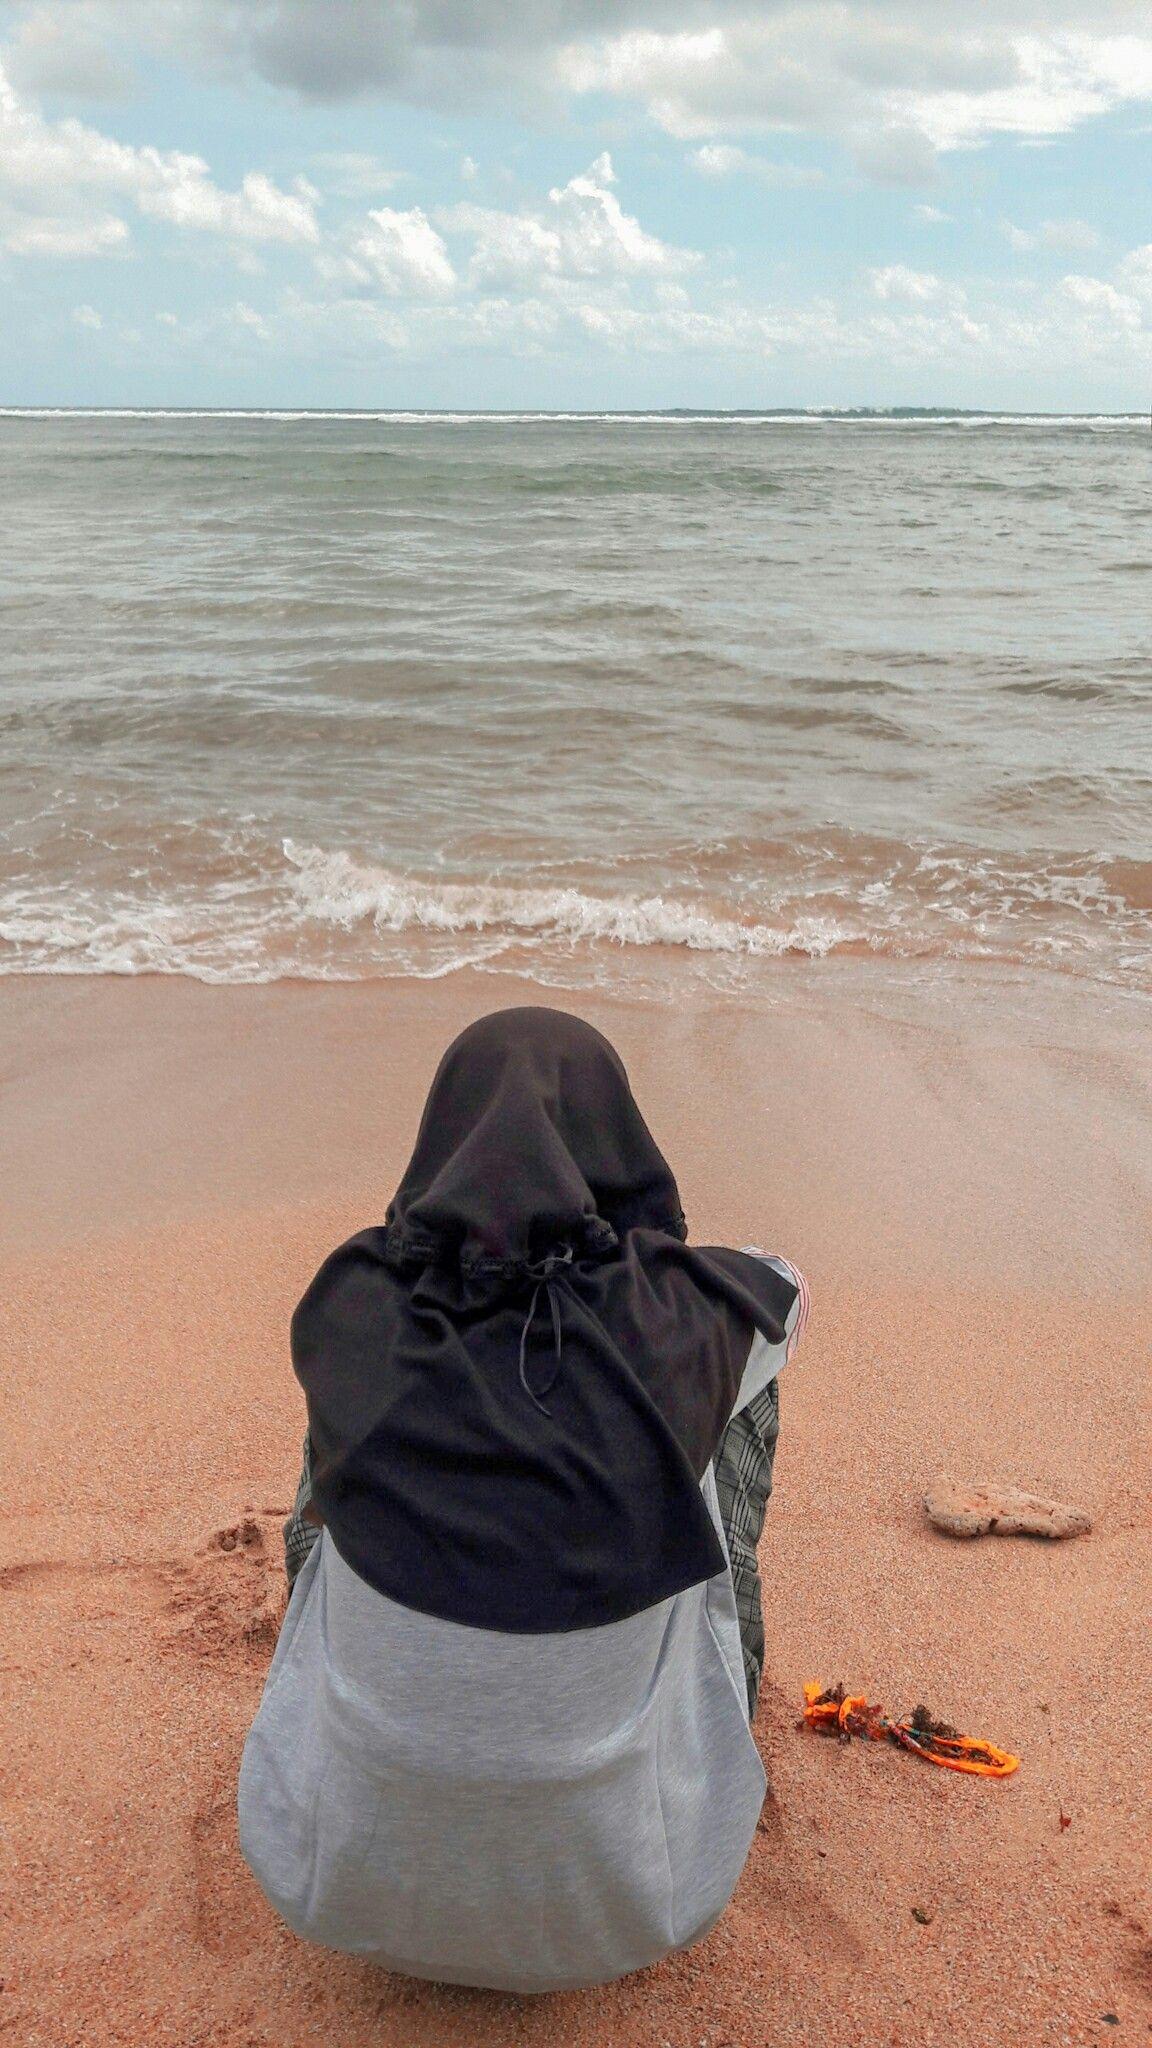 Pantai Potret Diri Gaya Rambut Pendek Anak Perempuan Gaya Remaja